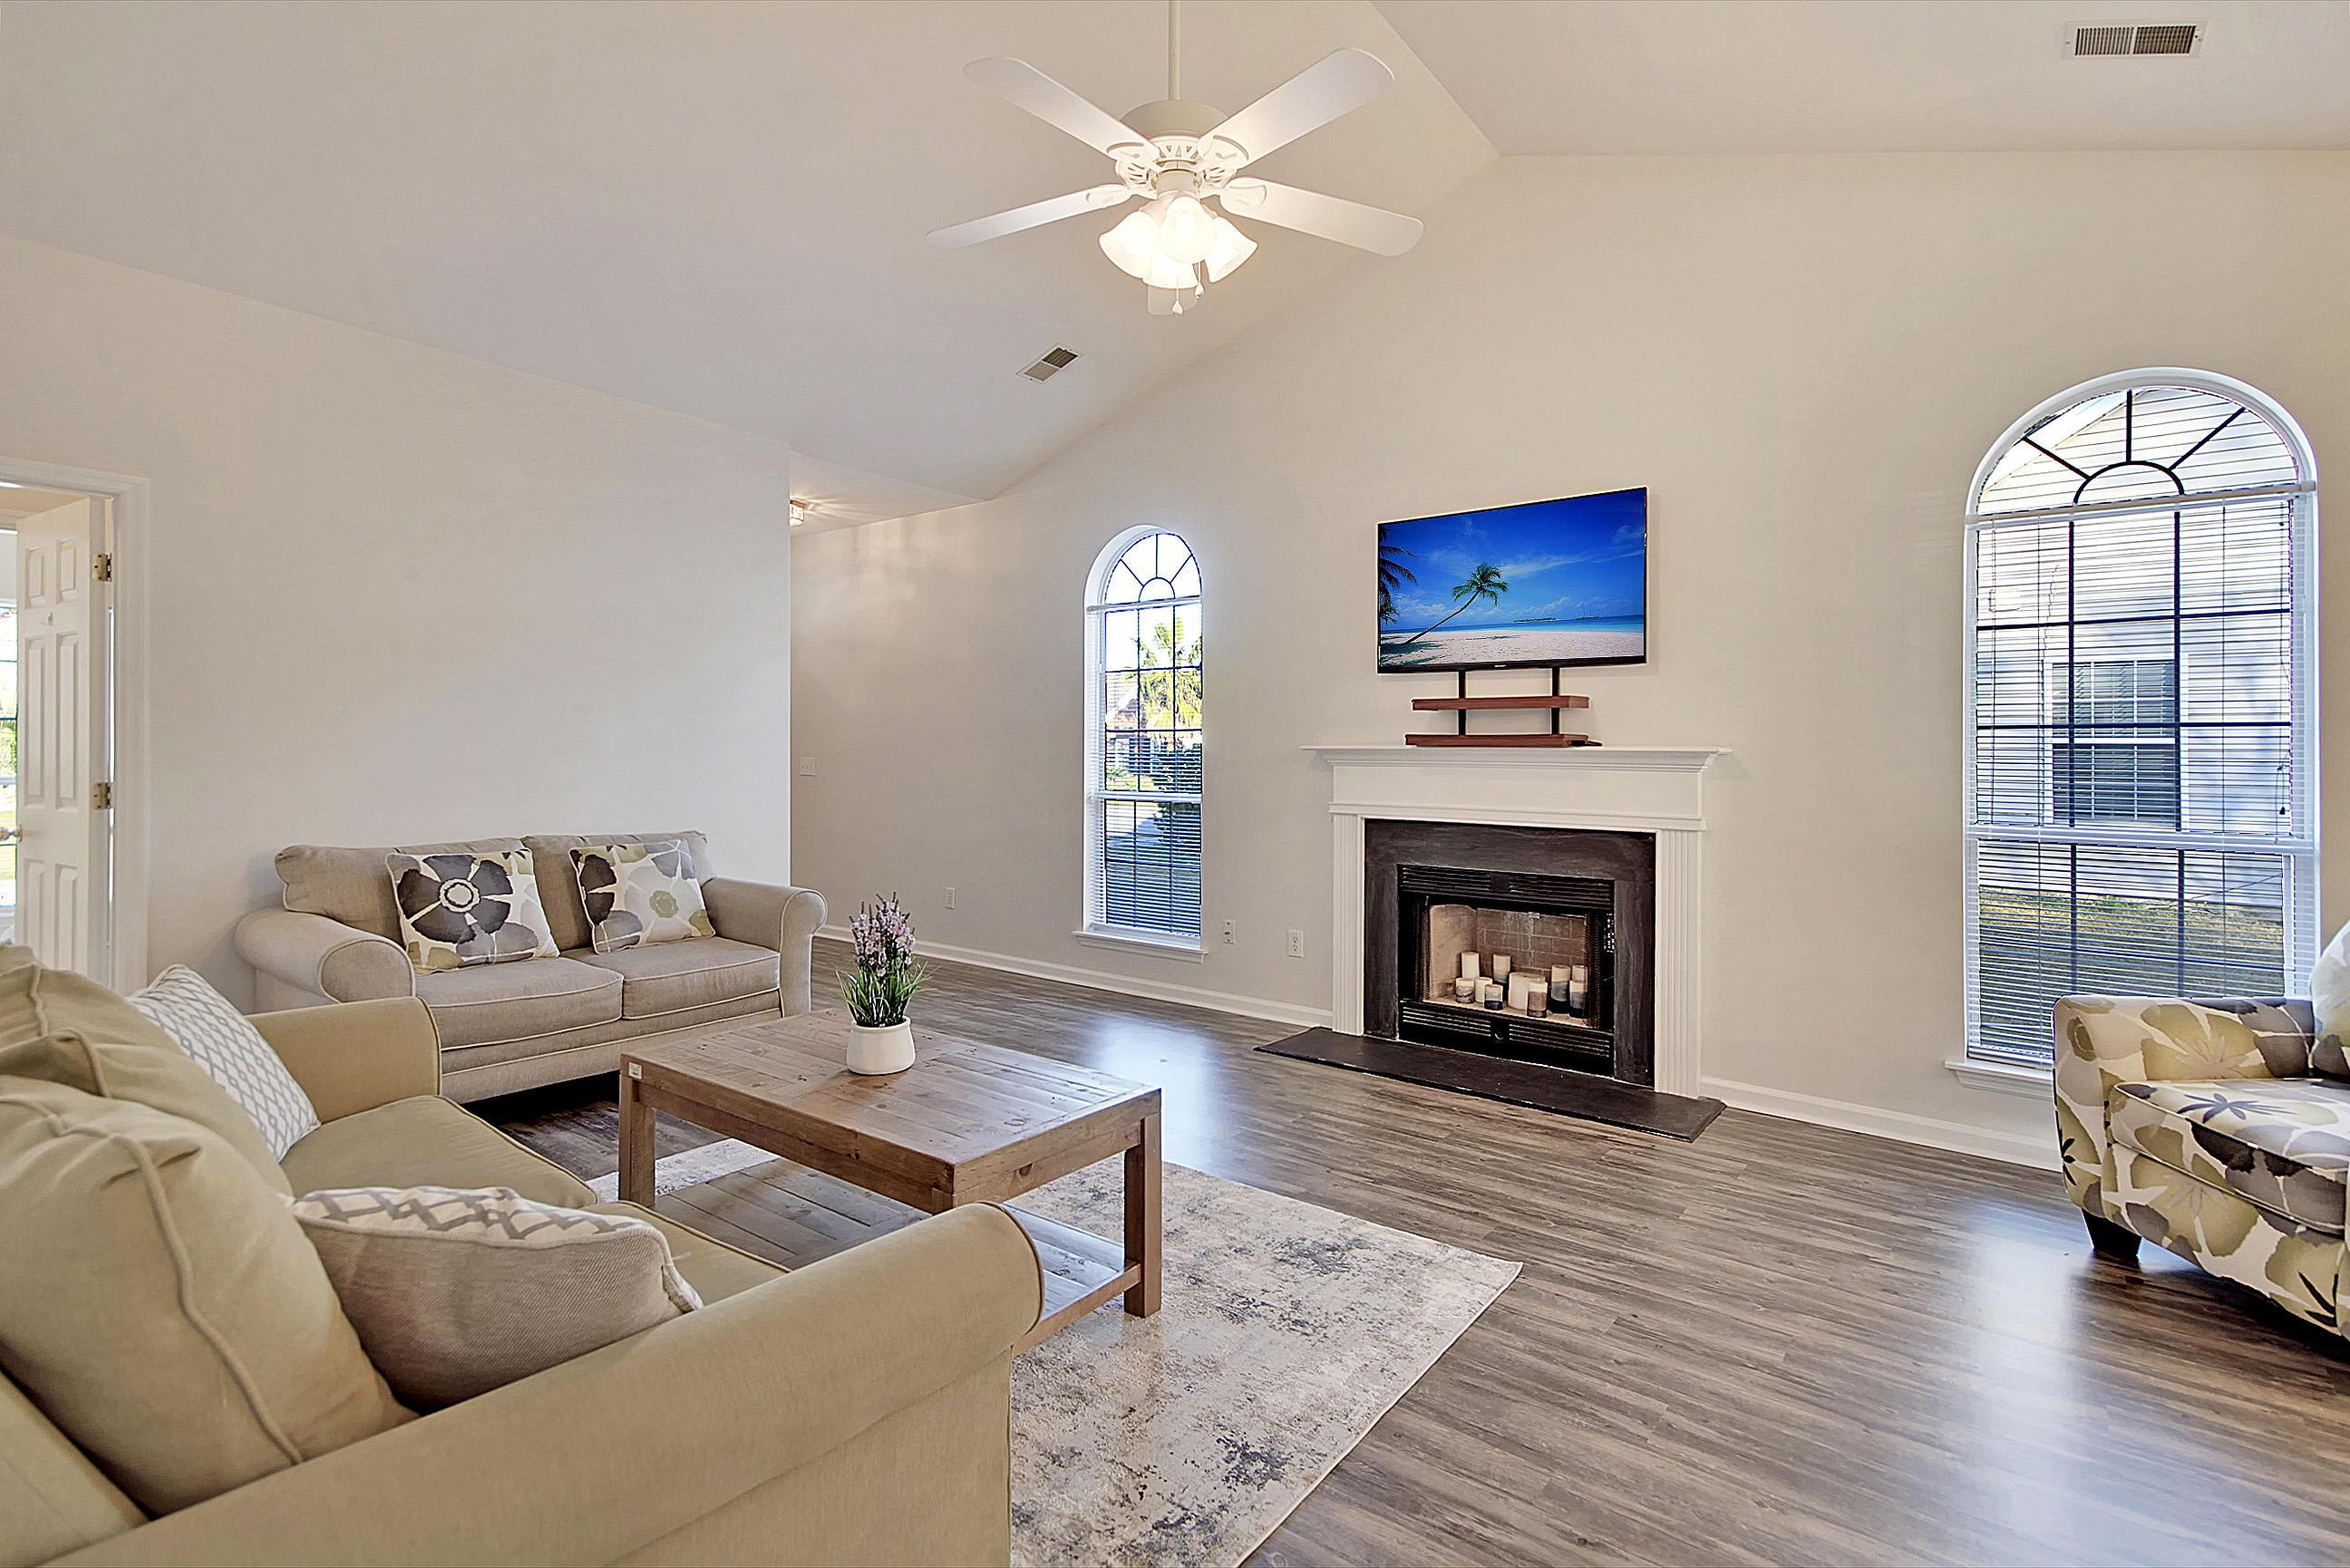 Dunes West Homes For Sale - 2656 Palmetto Hall, Mount Pleasant, SC - 28